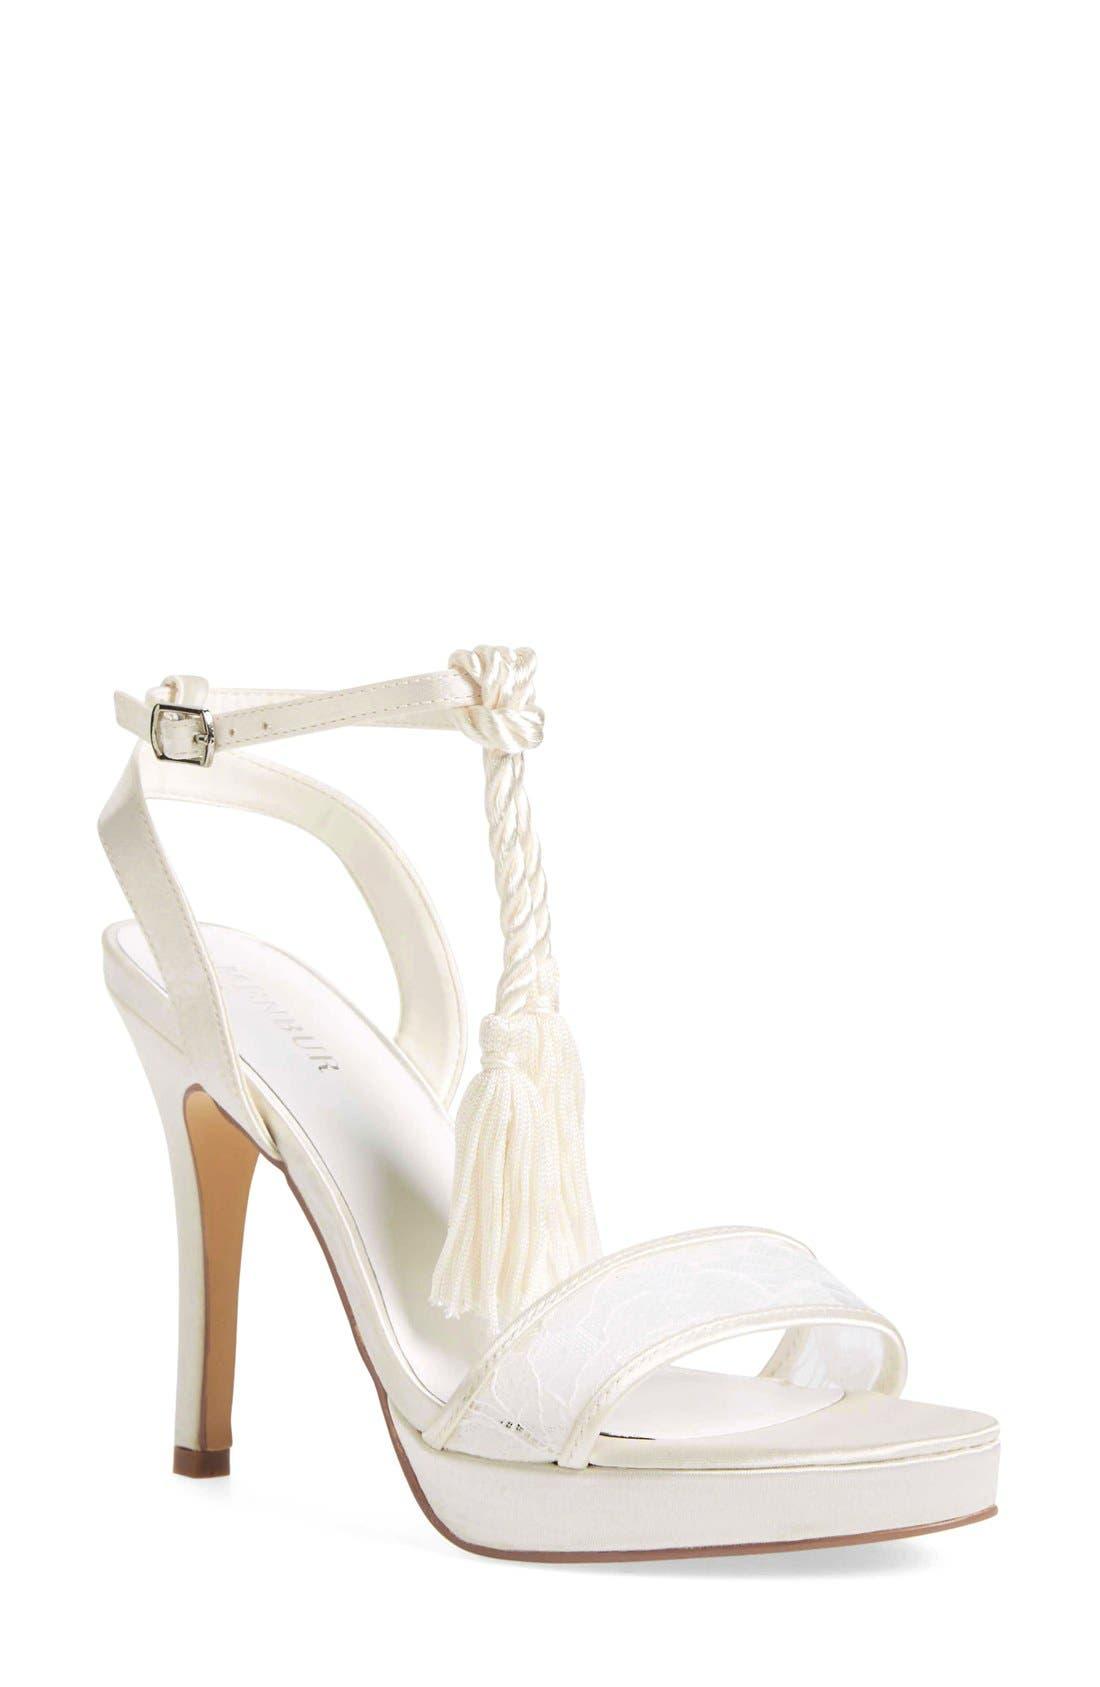 Main Image - Menbur 'Dalila' Bridal Sandal (Women)